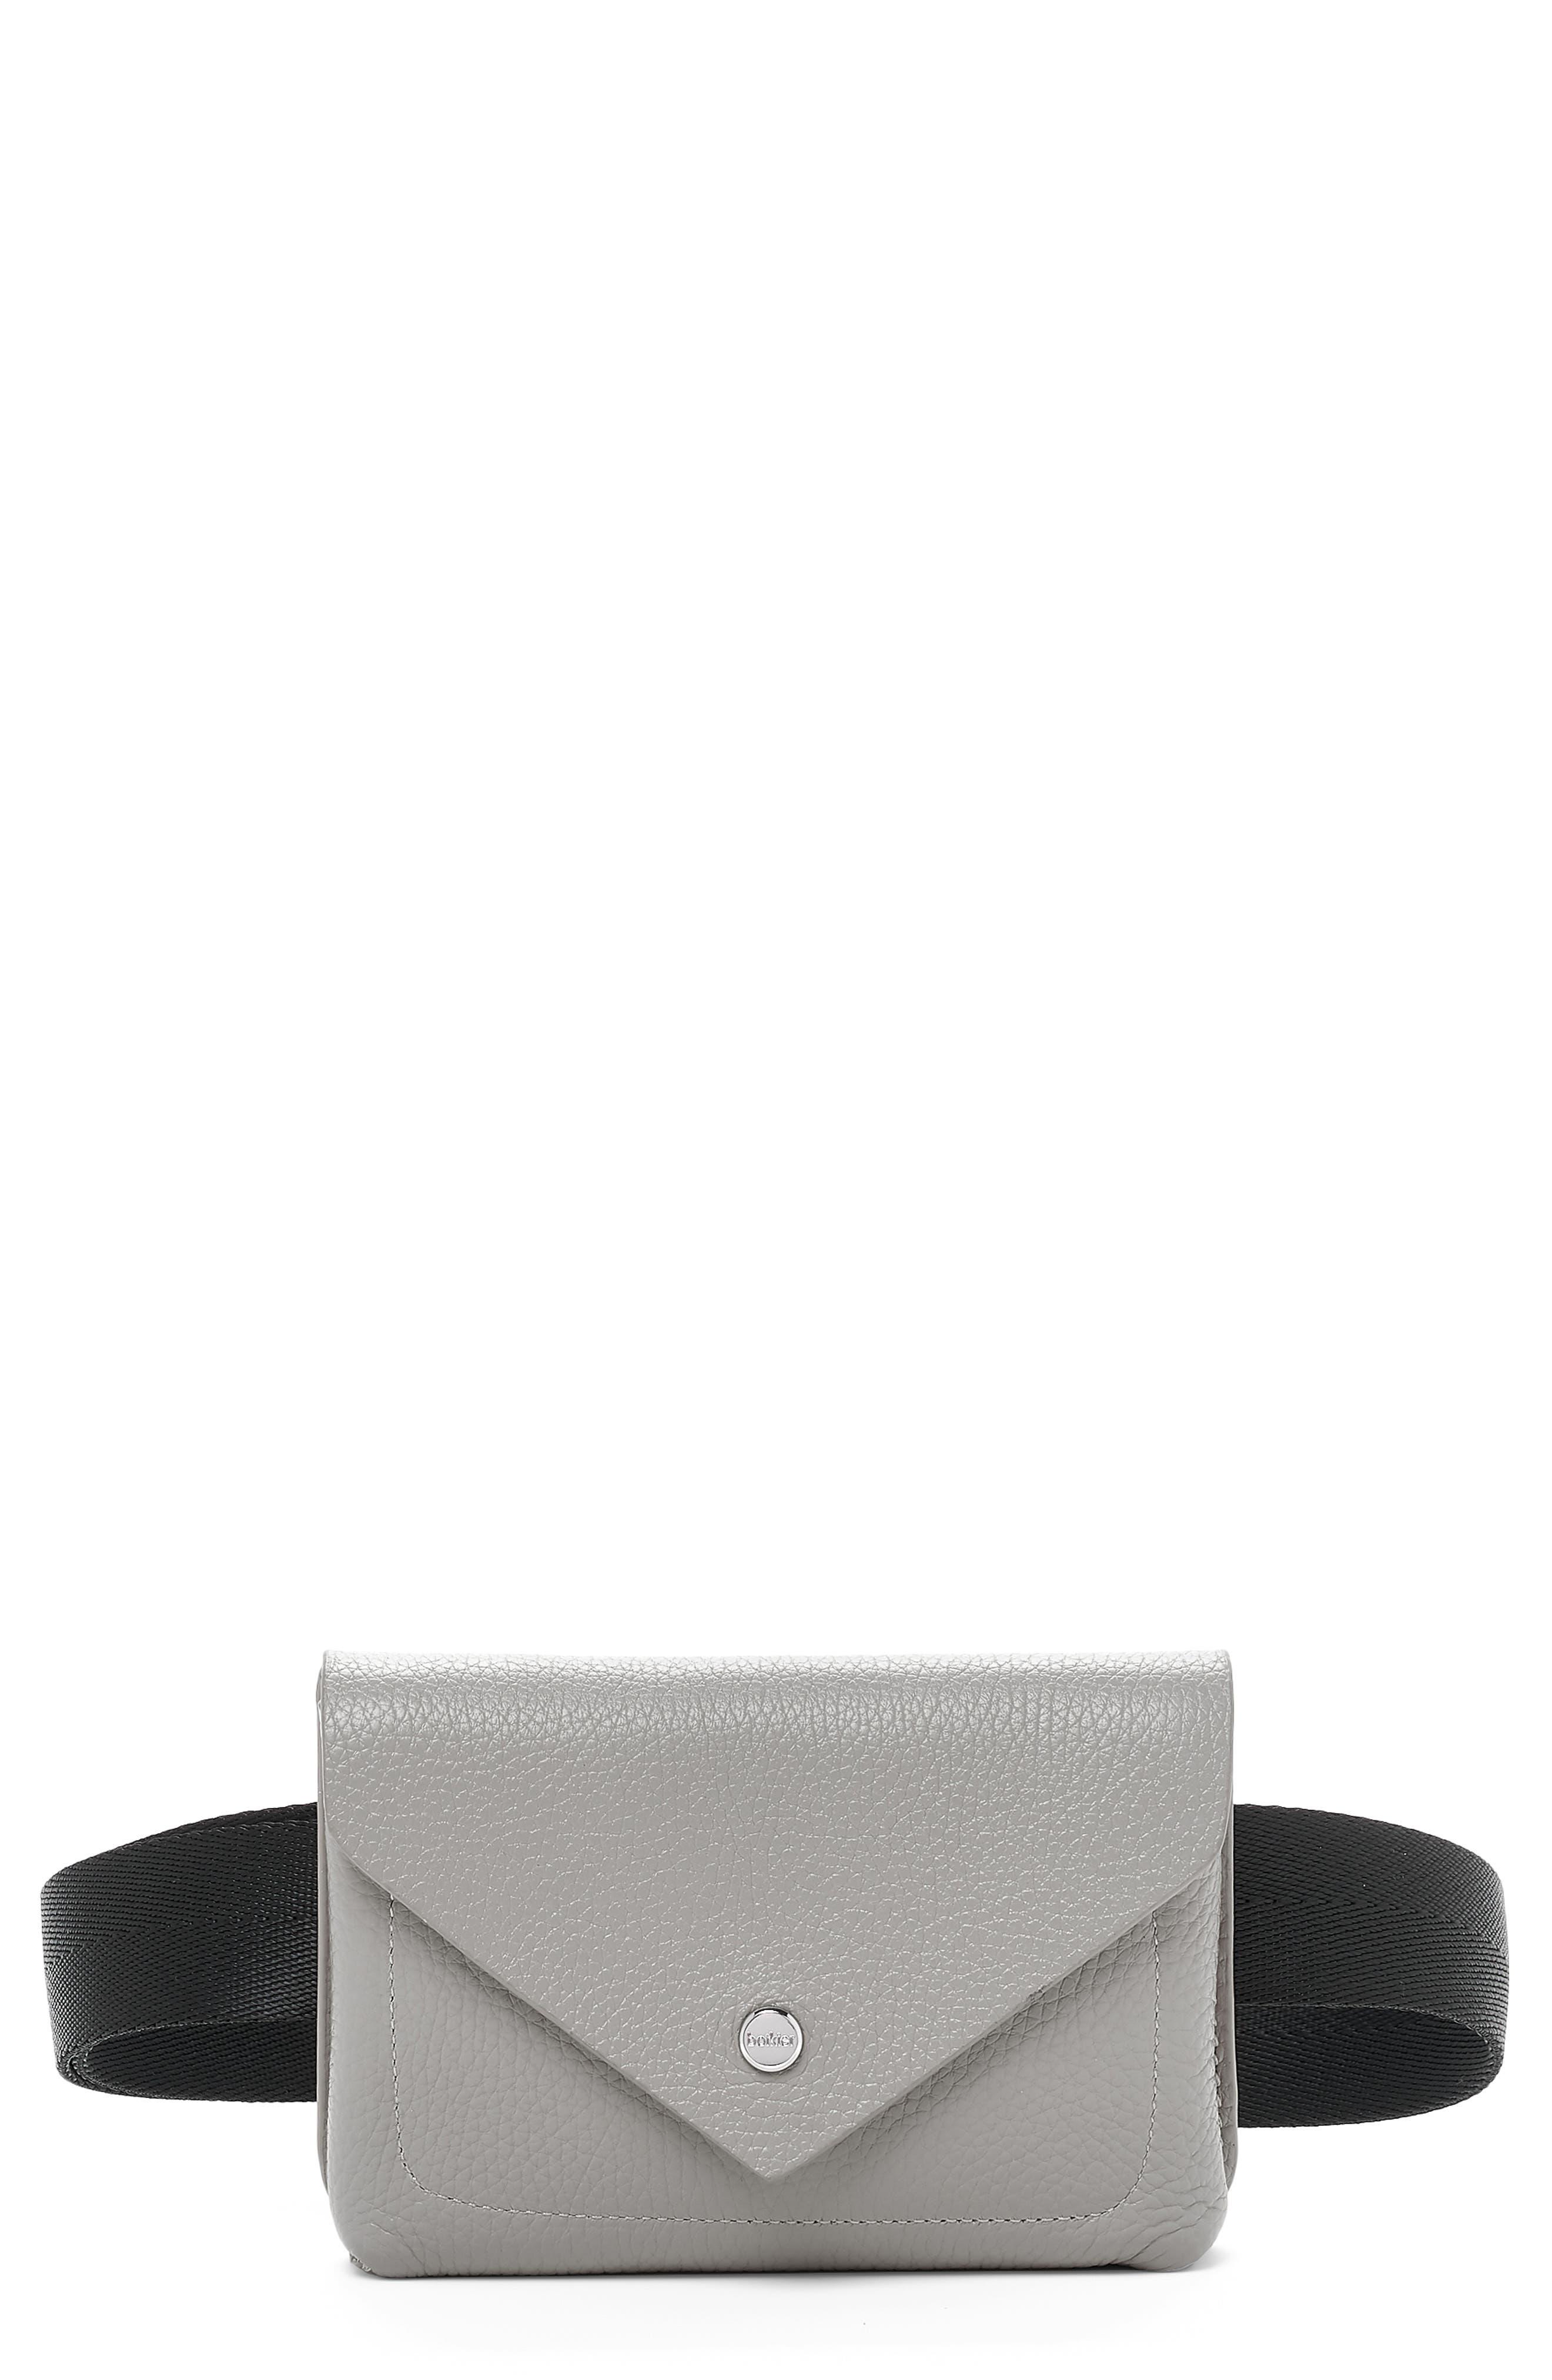 BOTKIER,                             Vivi Calfskin Leather Belt Bag,                             Main thumbnail 1, color,                             SILVER GREY